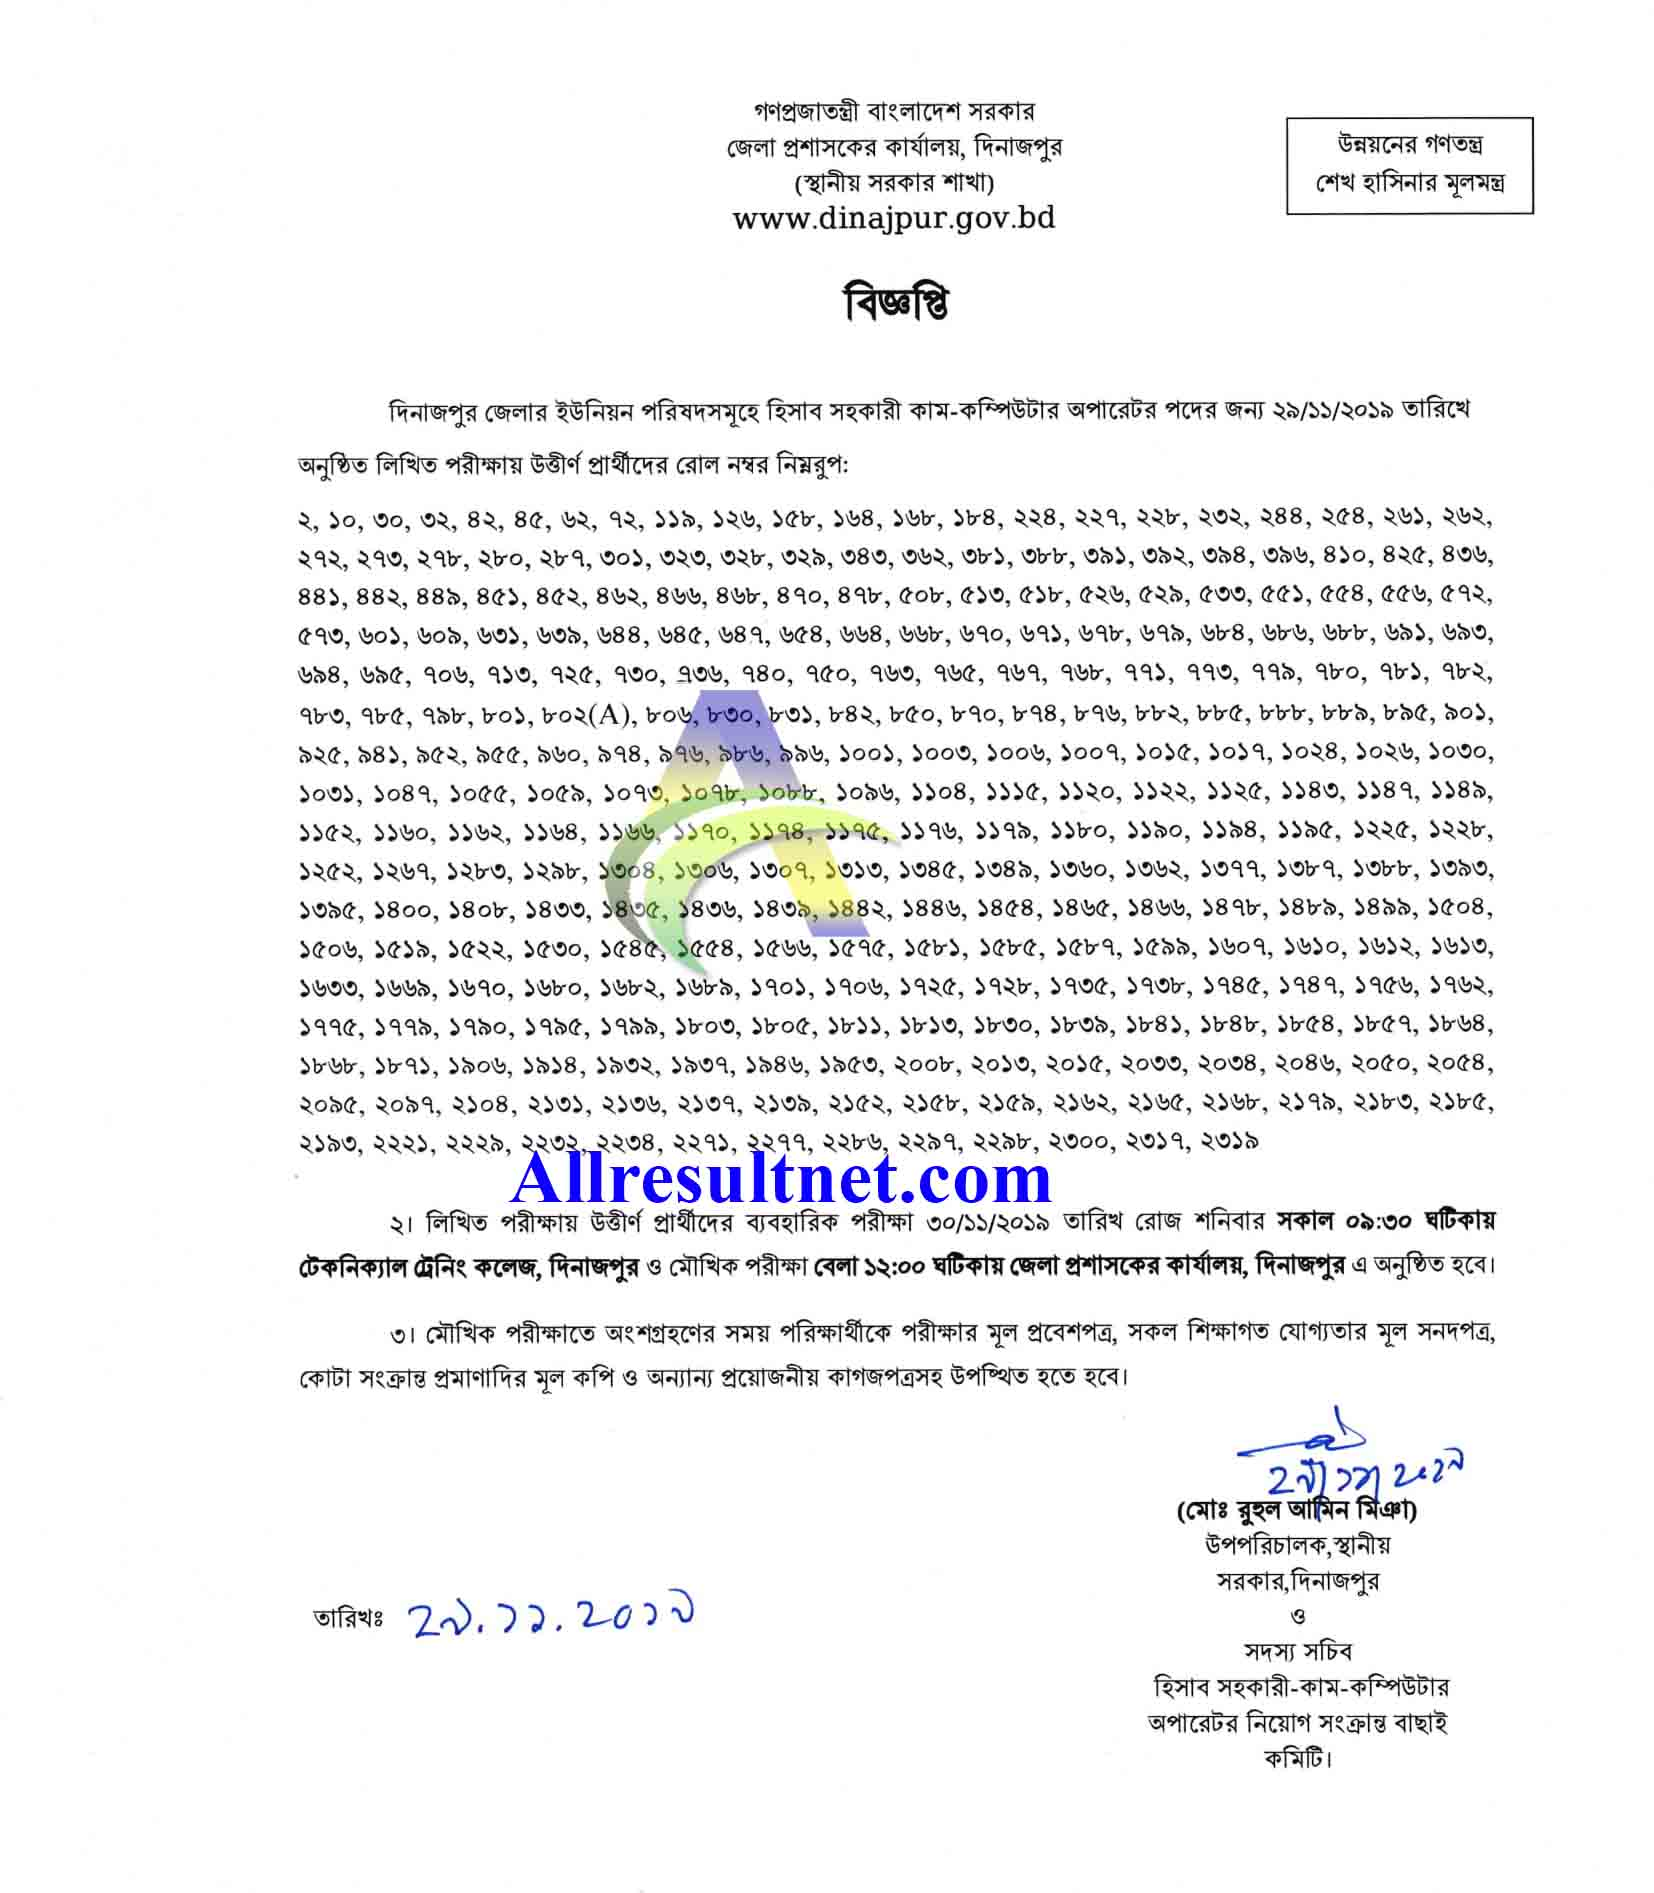 Dinajpur DC Office Job Result